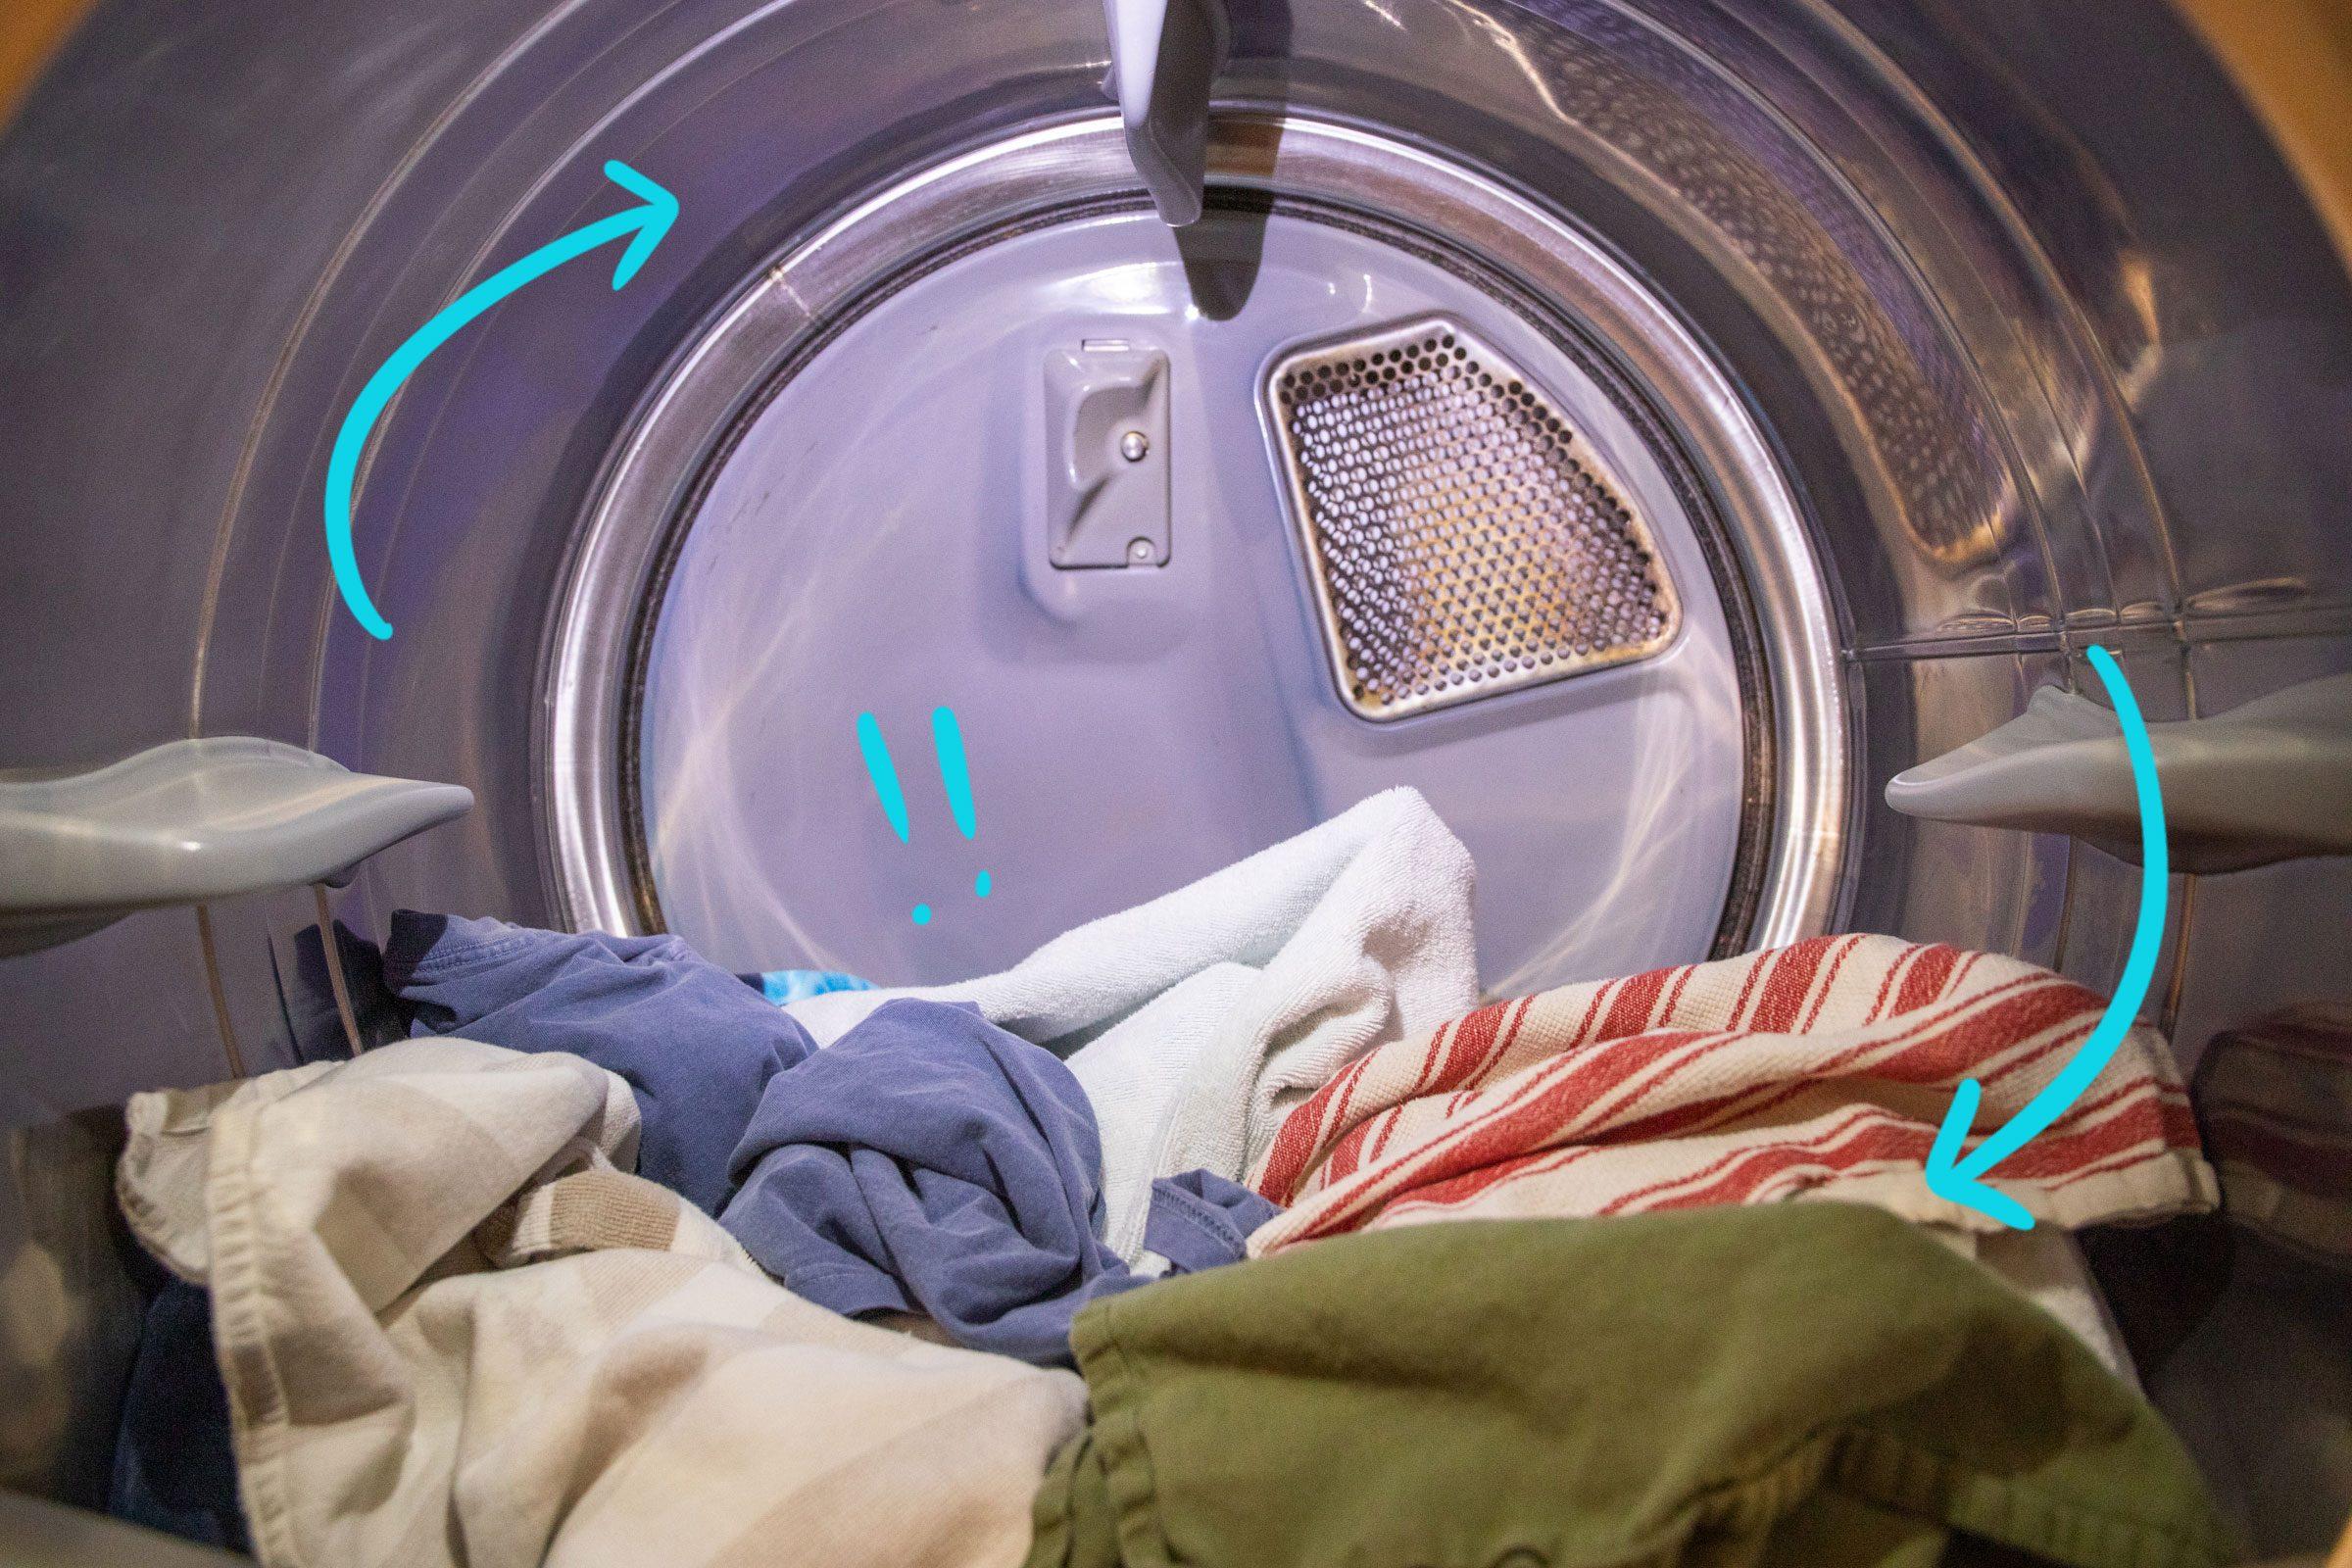 Dryerrotating